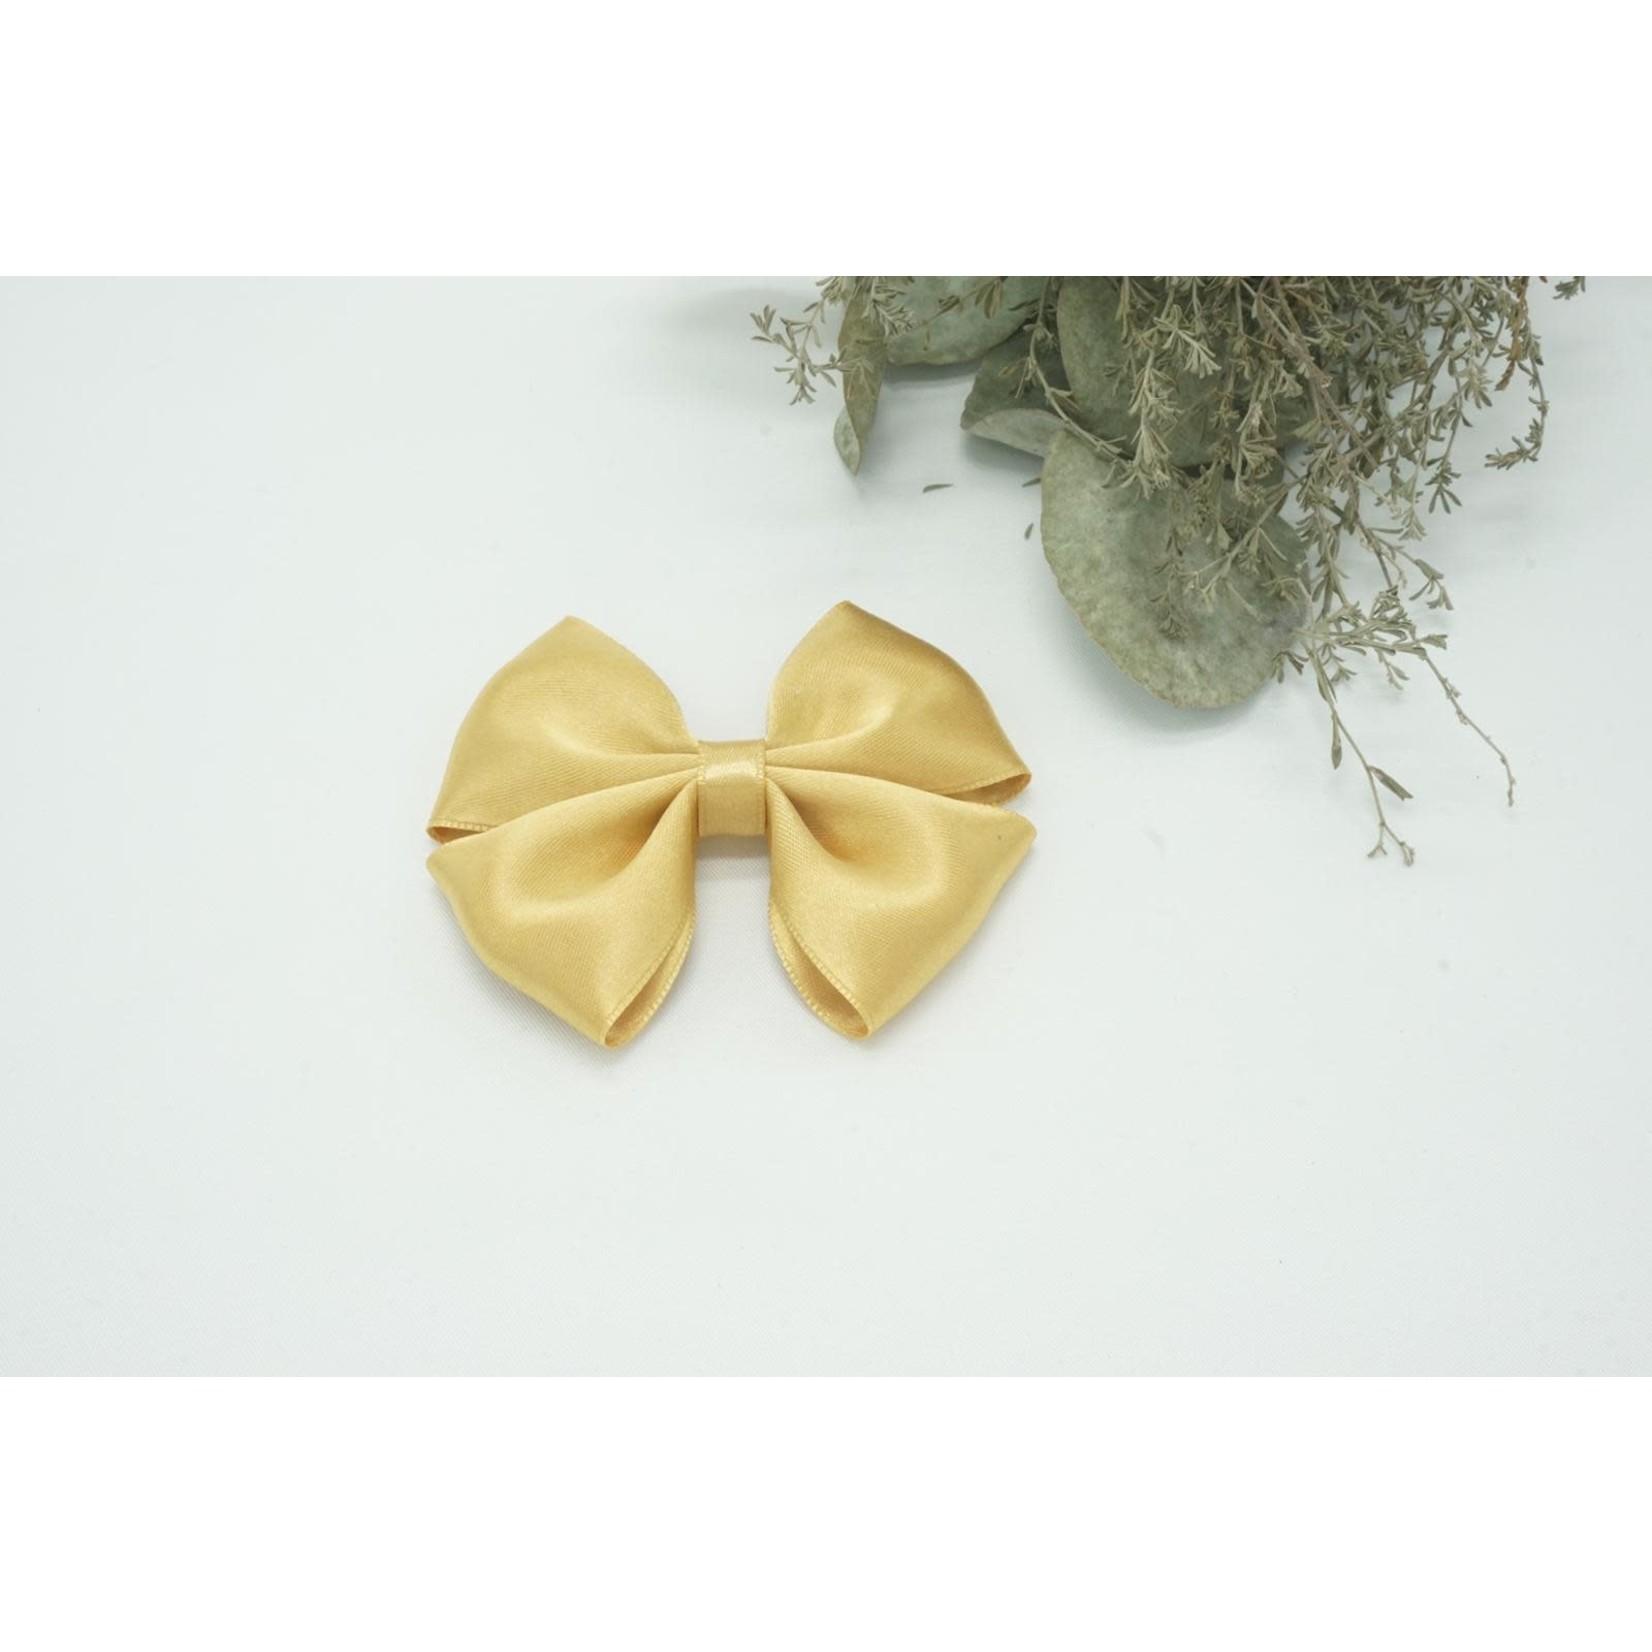 Petite Zara Satin Bow - Mustard